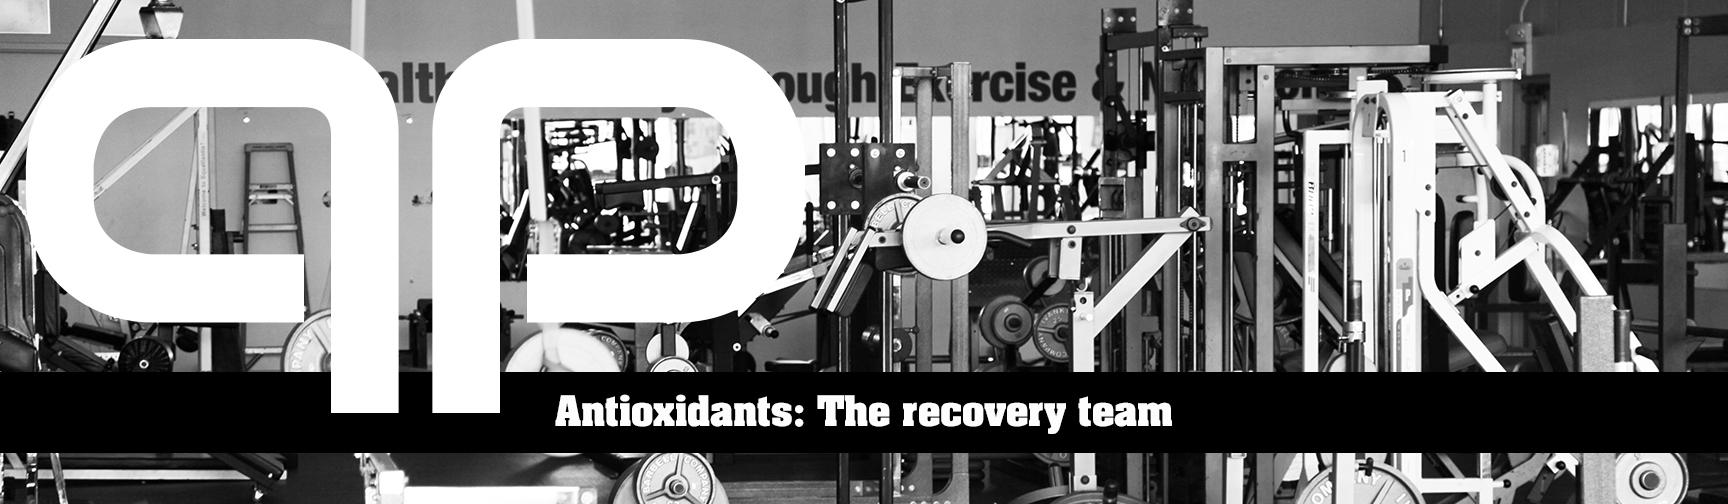 antioxidants-banner